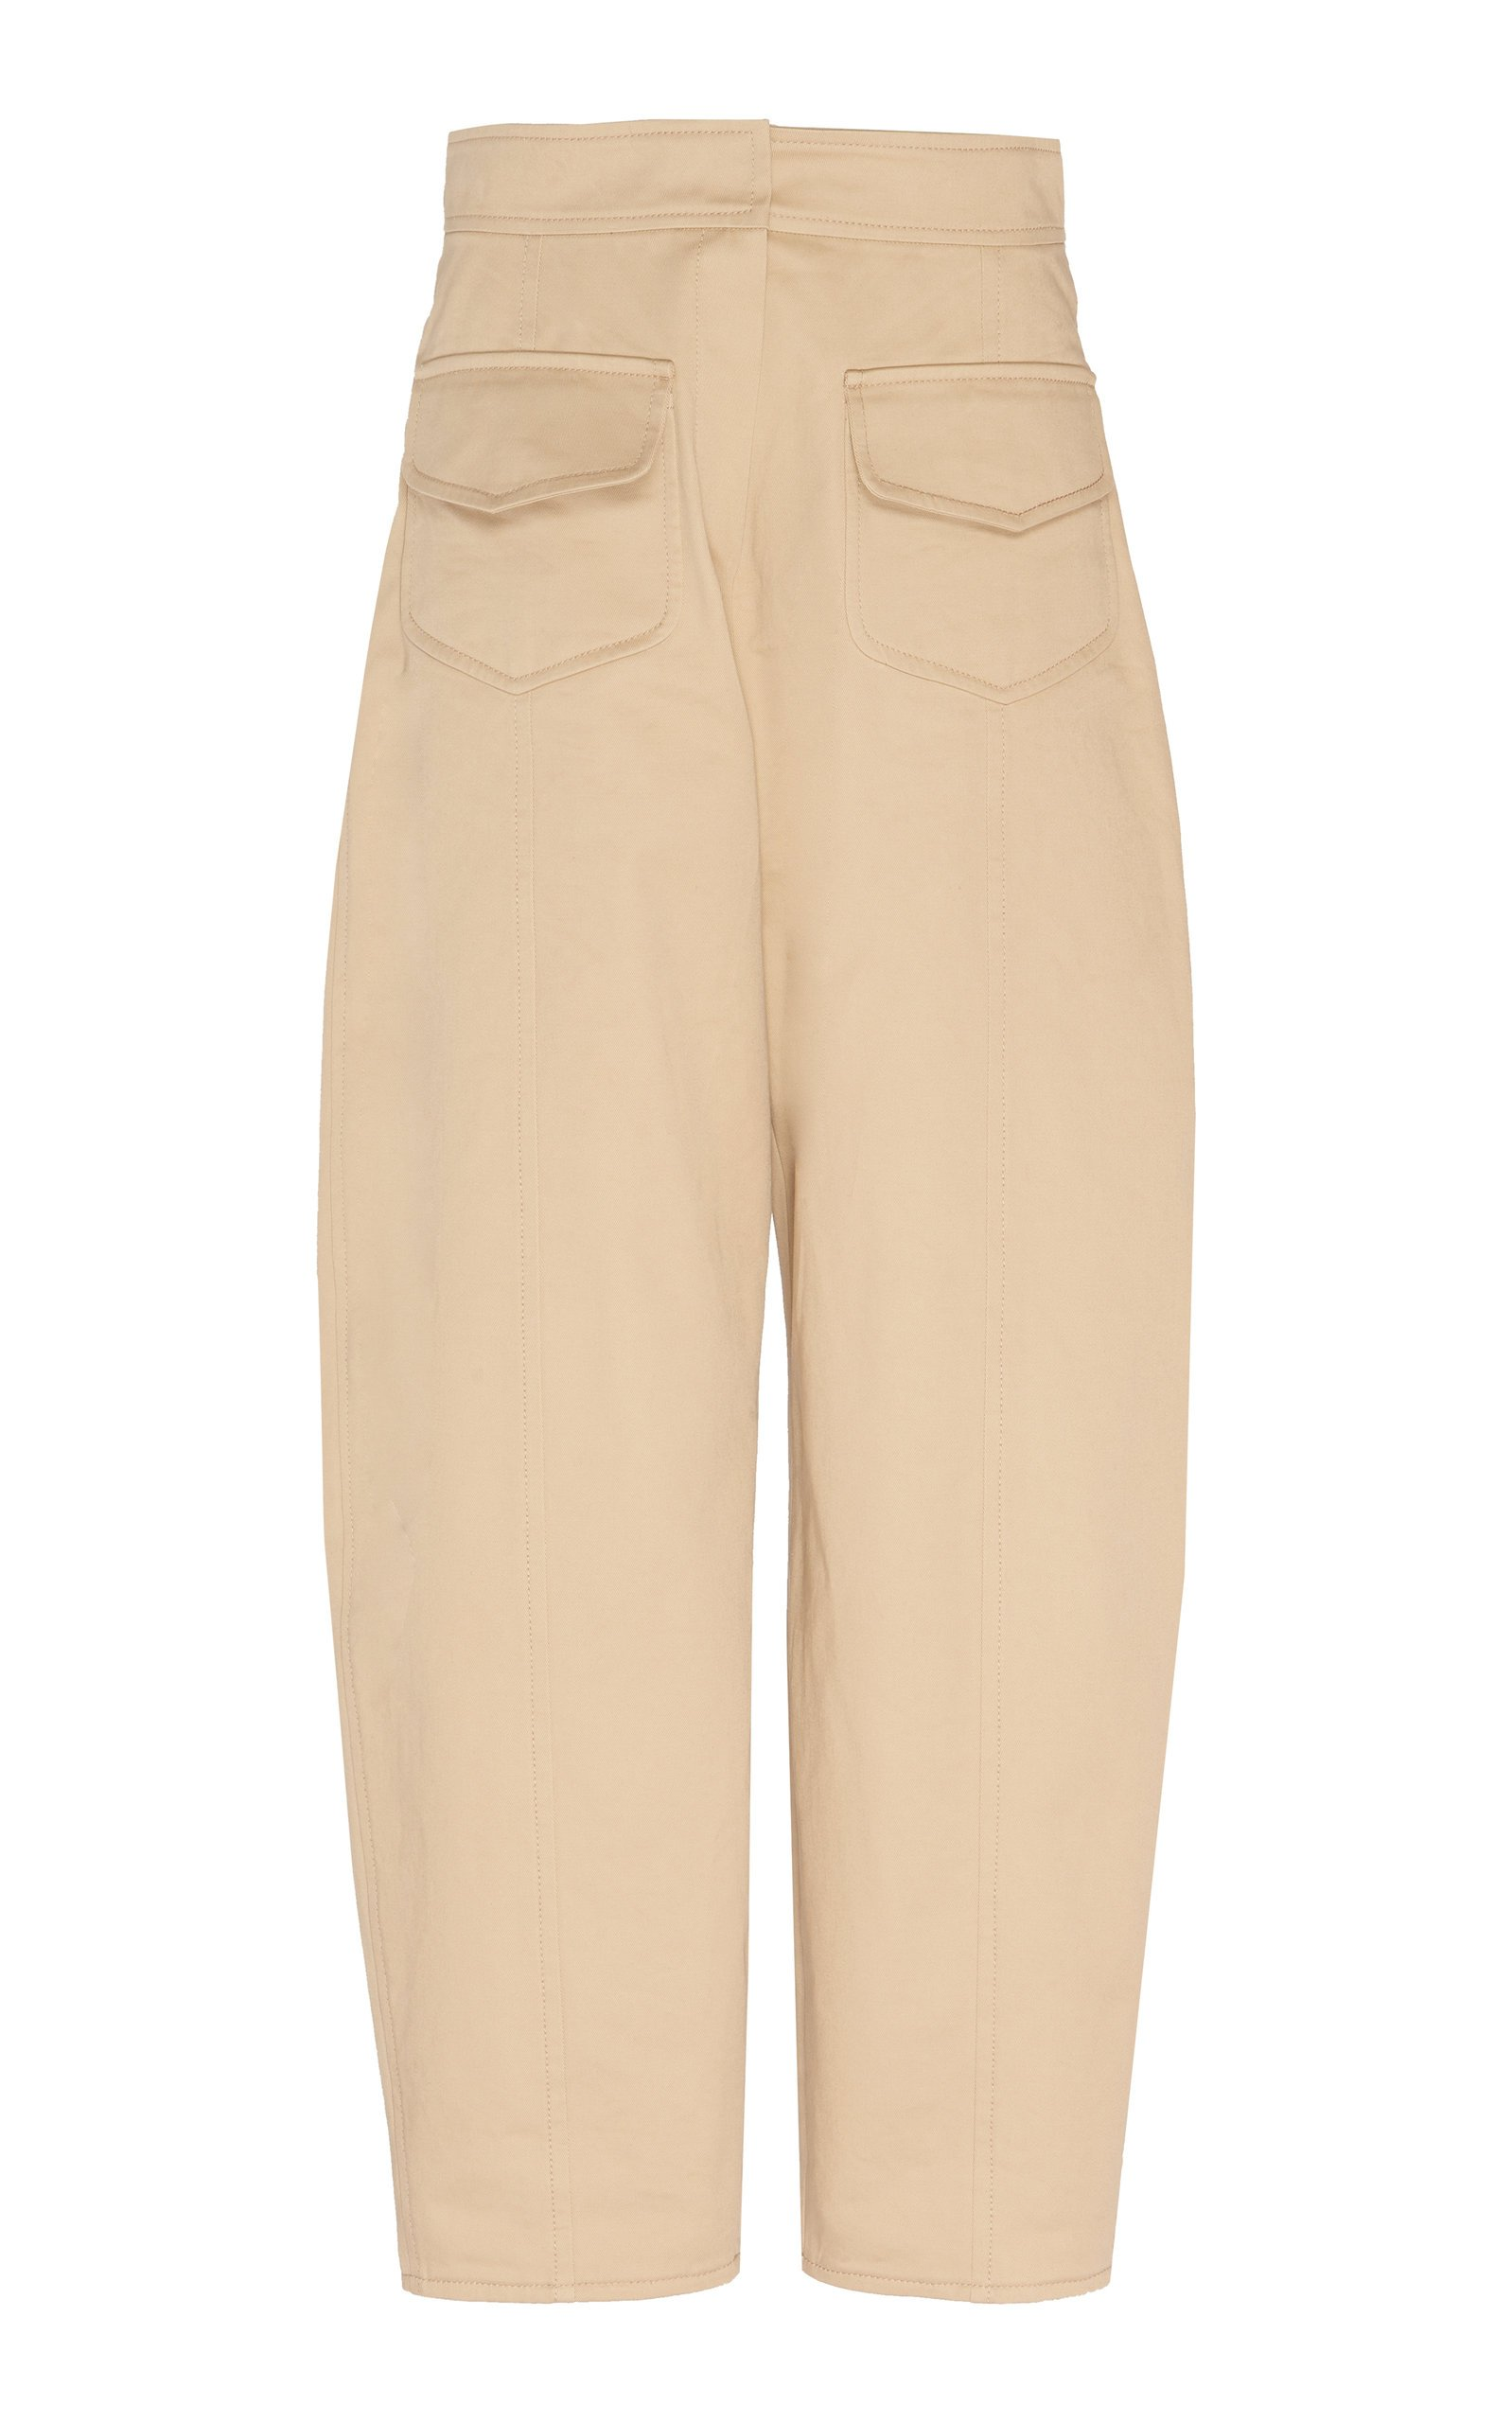 Martin Grant Cargo Pants